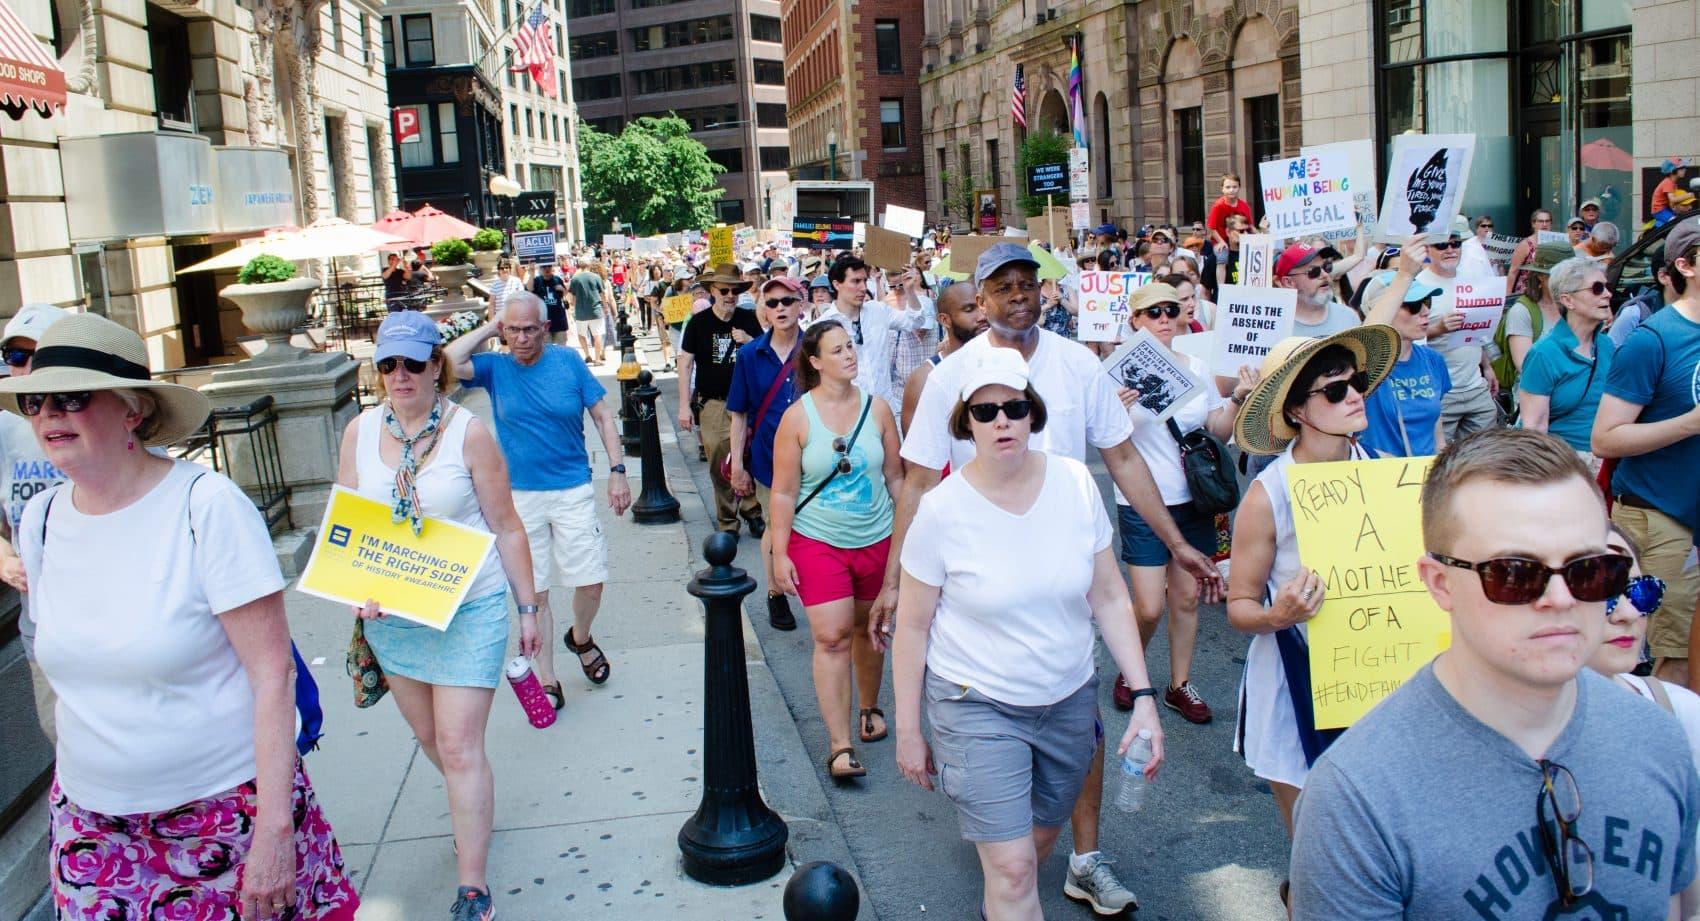 Demonstrators march toward Boston Common to protest U.S. immigration policies. (Elizabeth Gillis/WBUR)